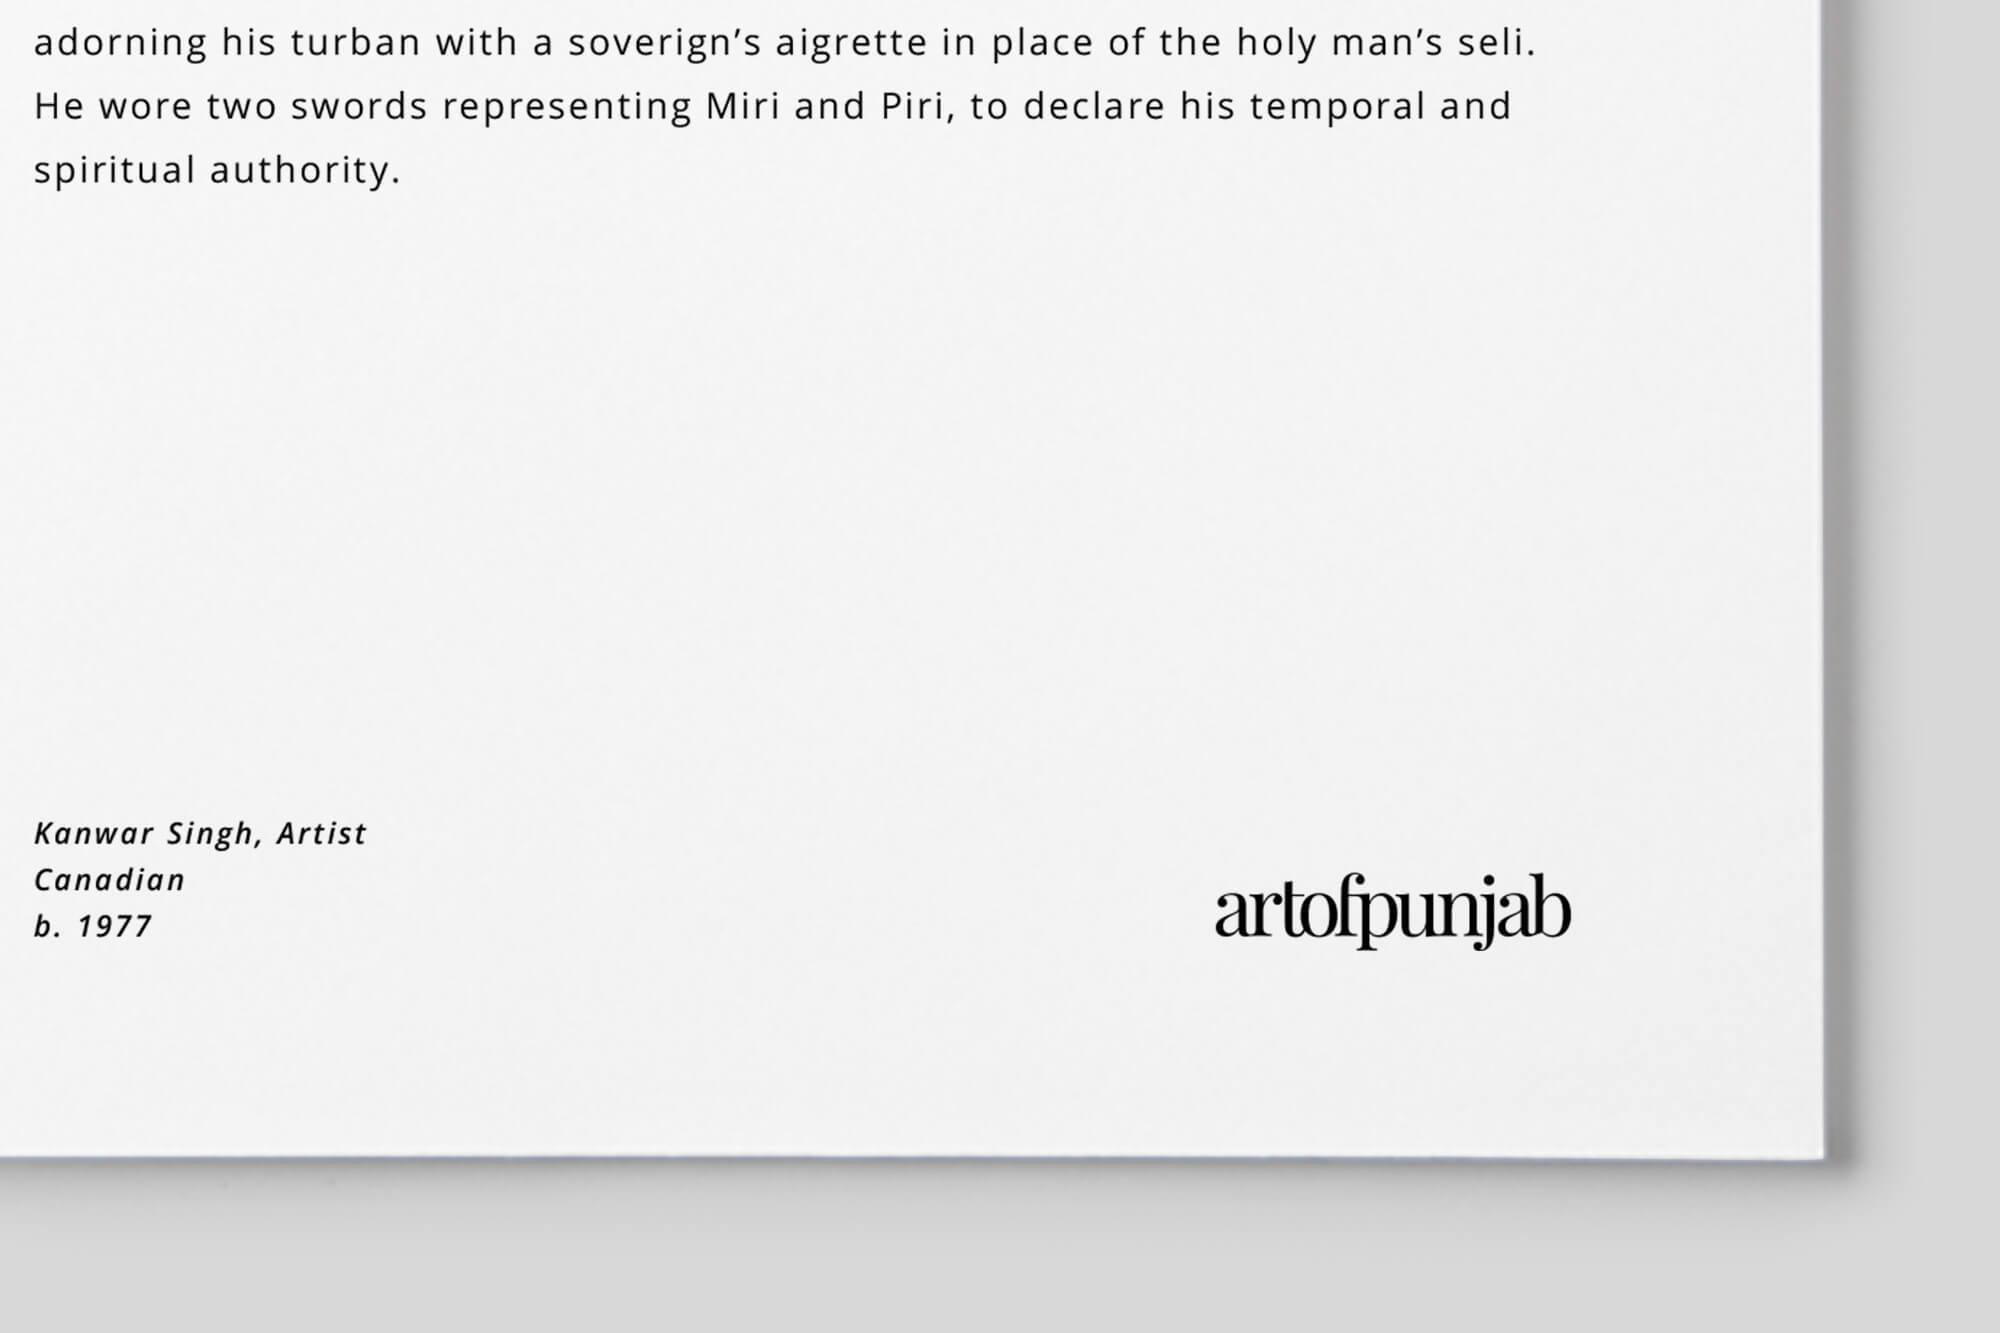 ArtofPunjab-identity-6